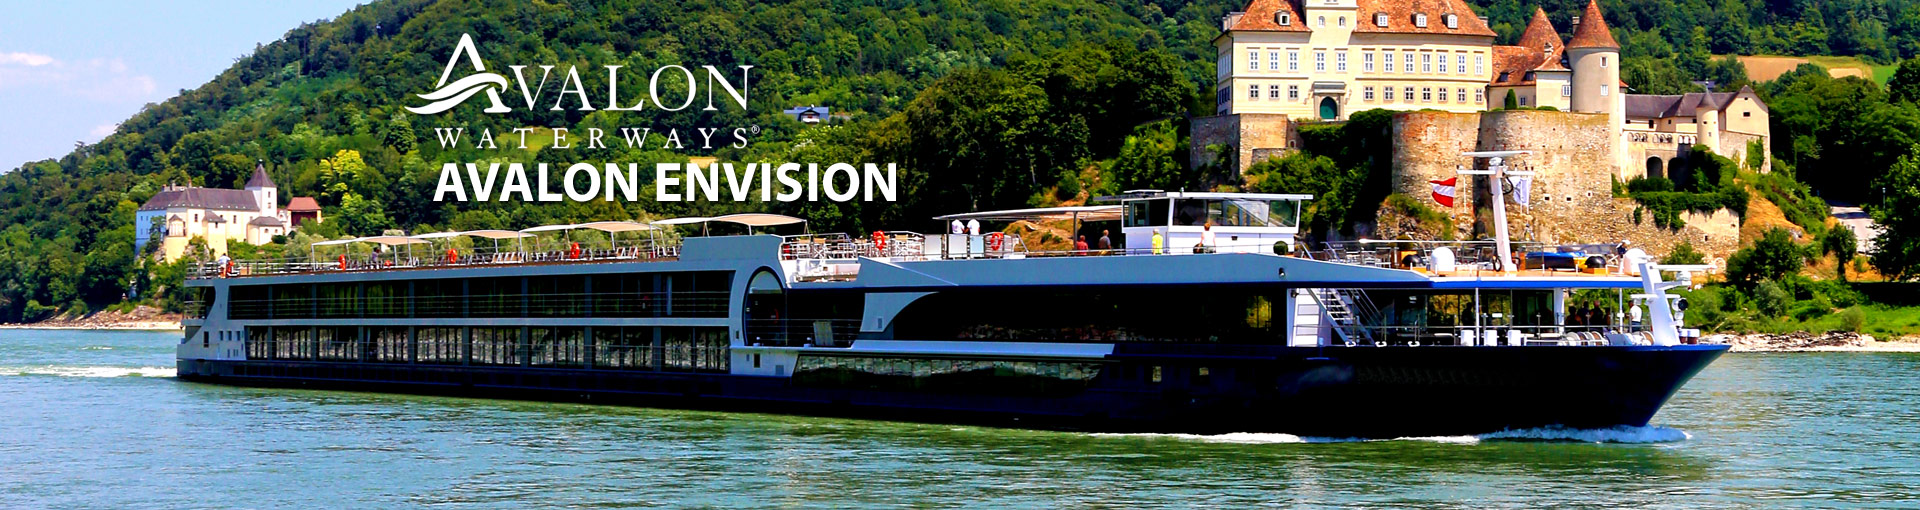 Avalon Waterways Avalon Envision river ship